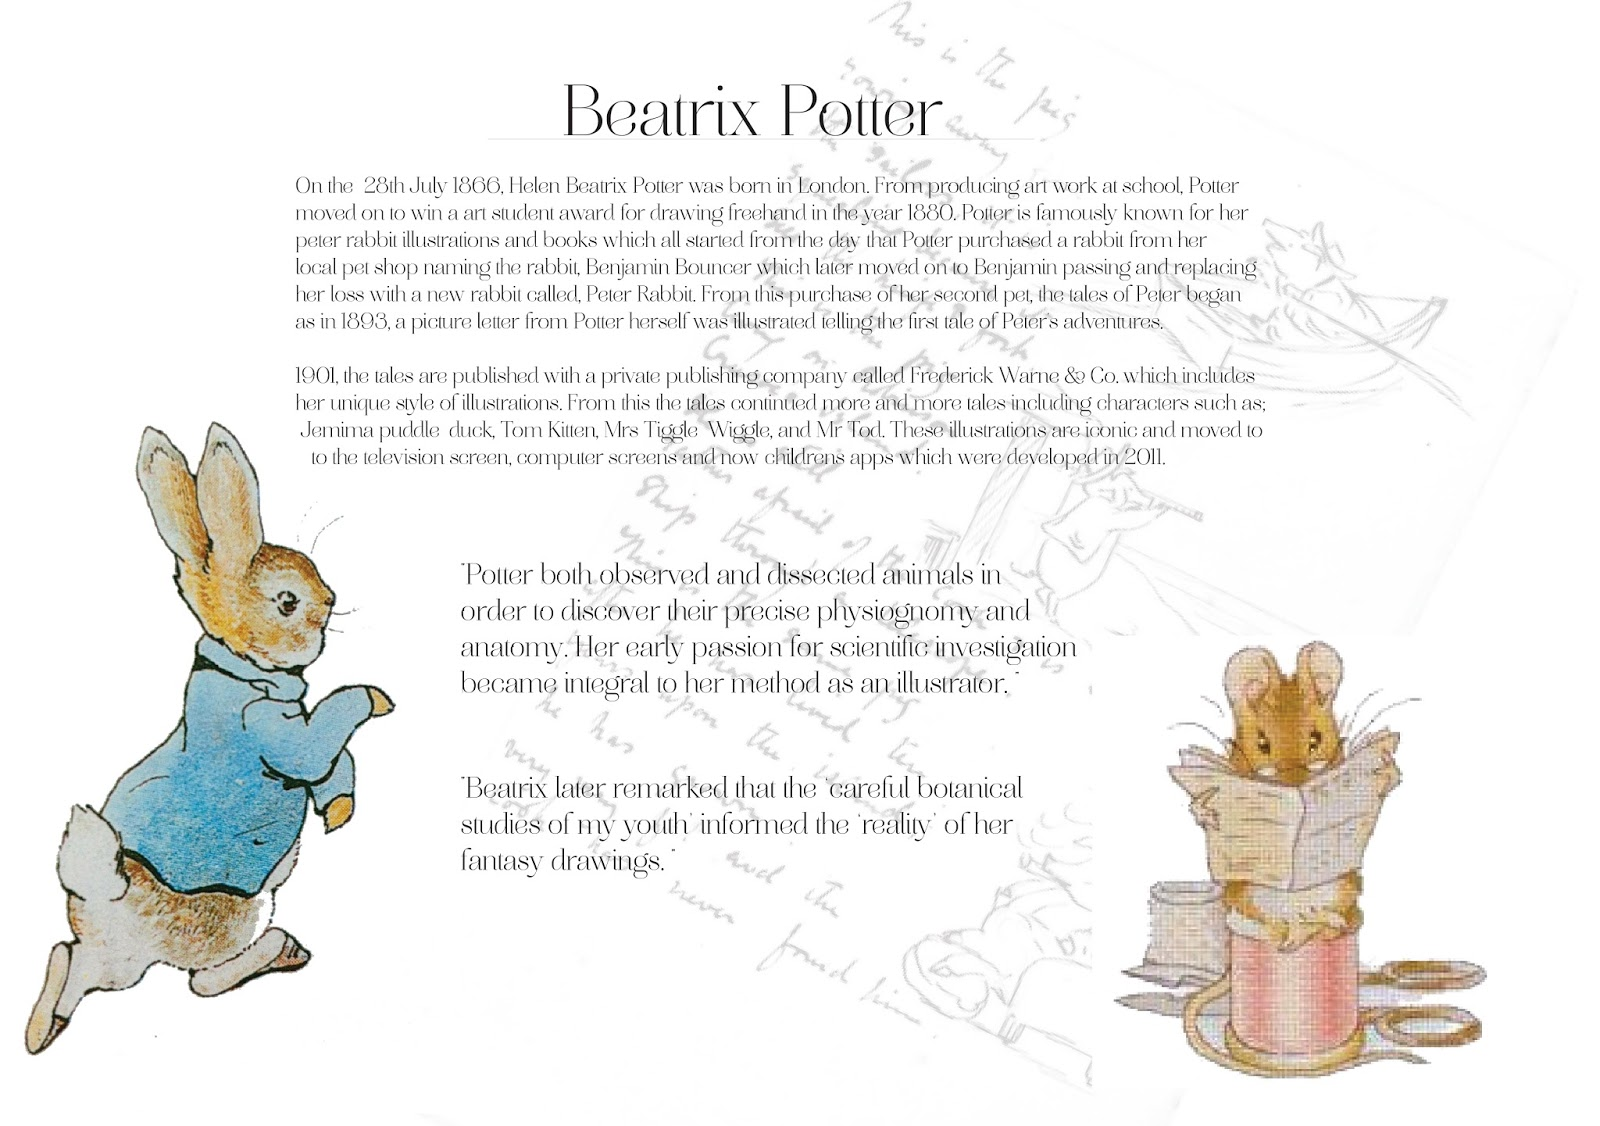 PAGE 2-SuccessSprinters: BEATRIX POTTER + LEWIS CARROLL - ENGLAND